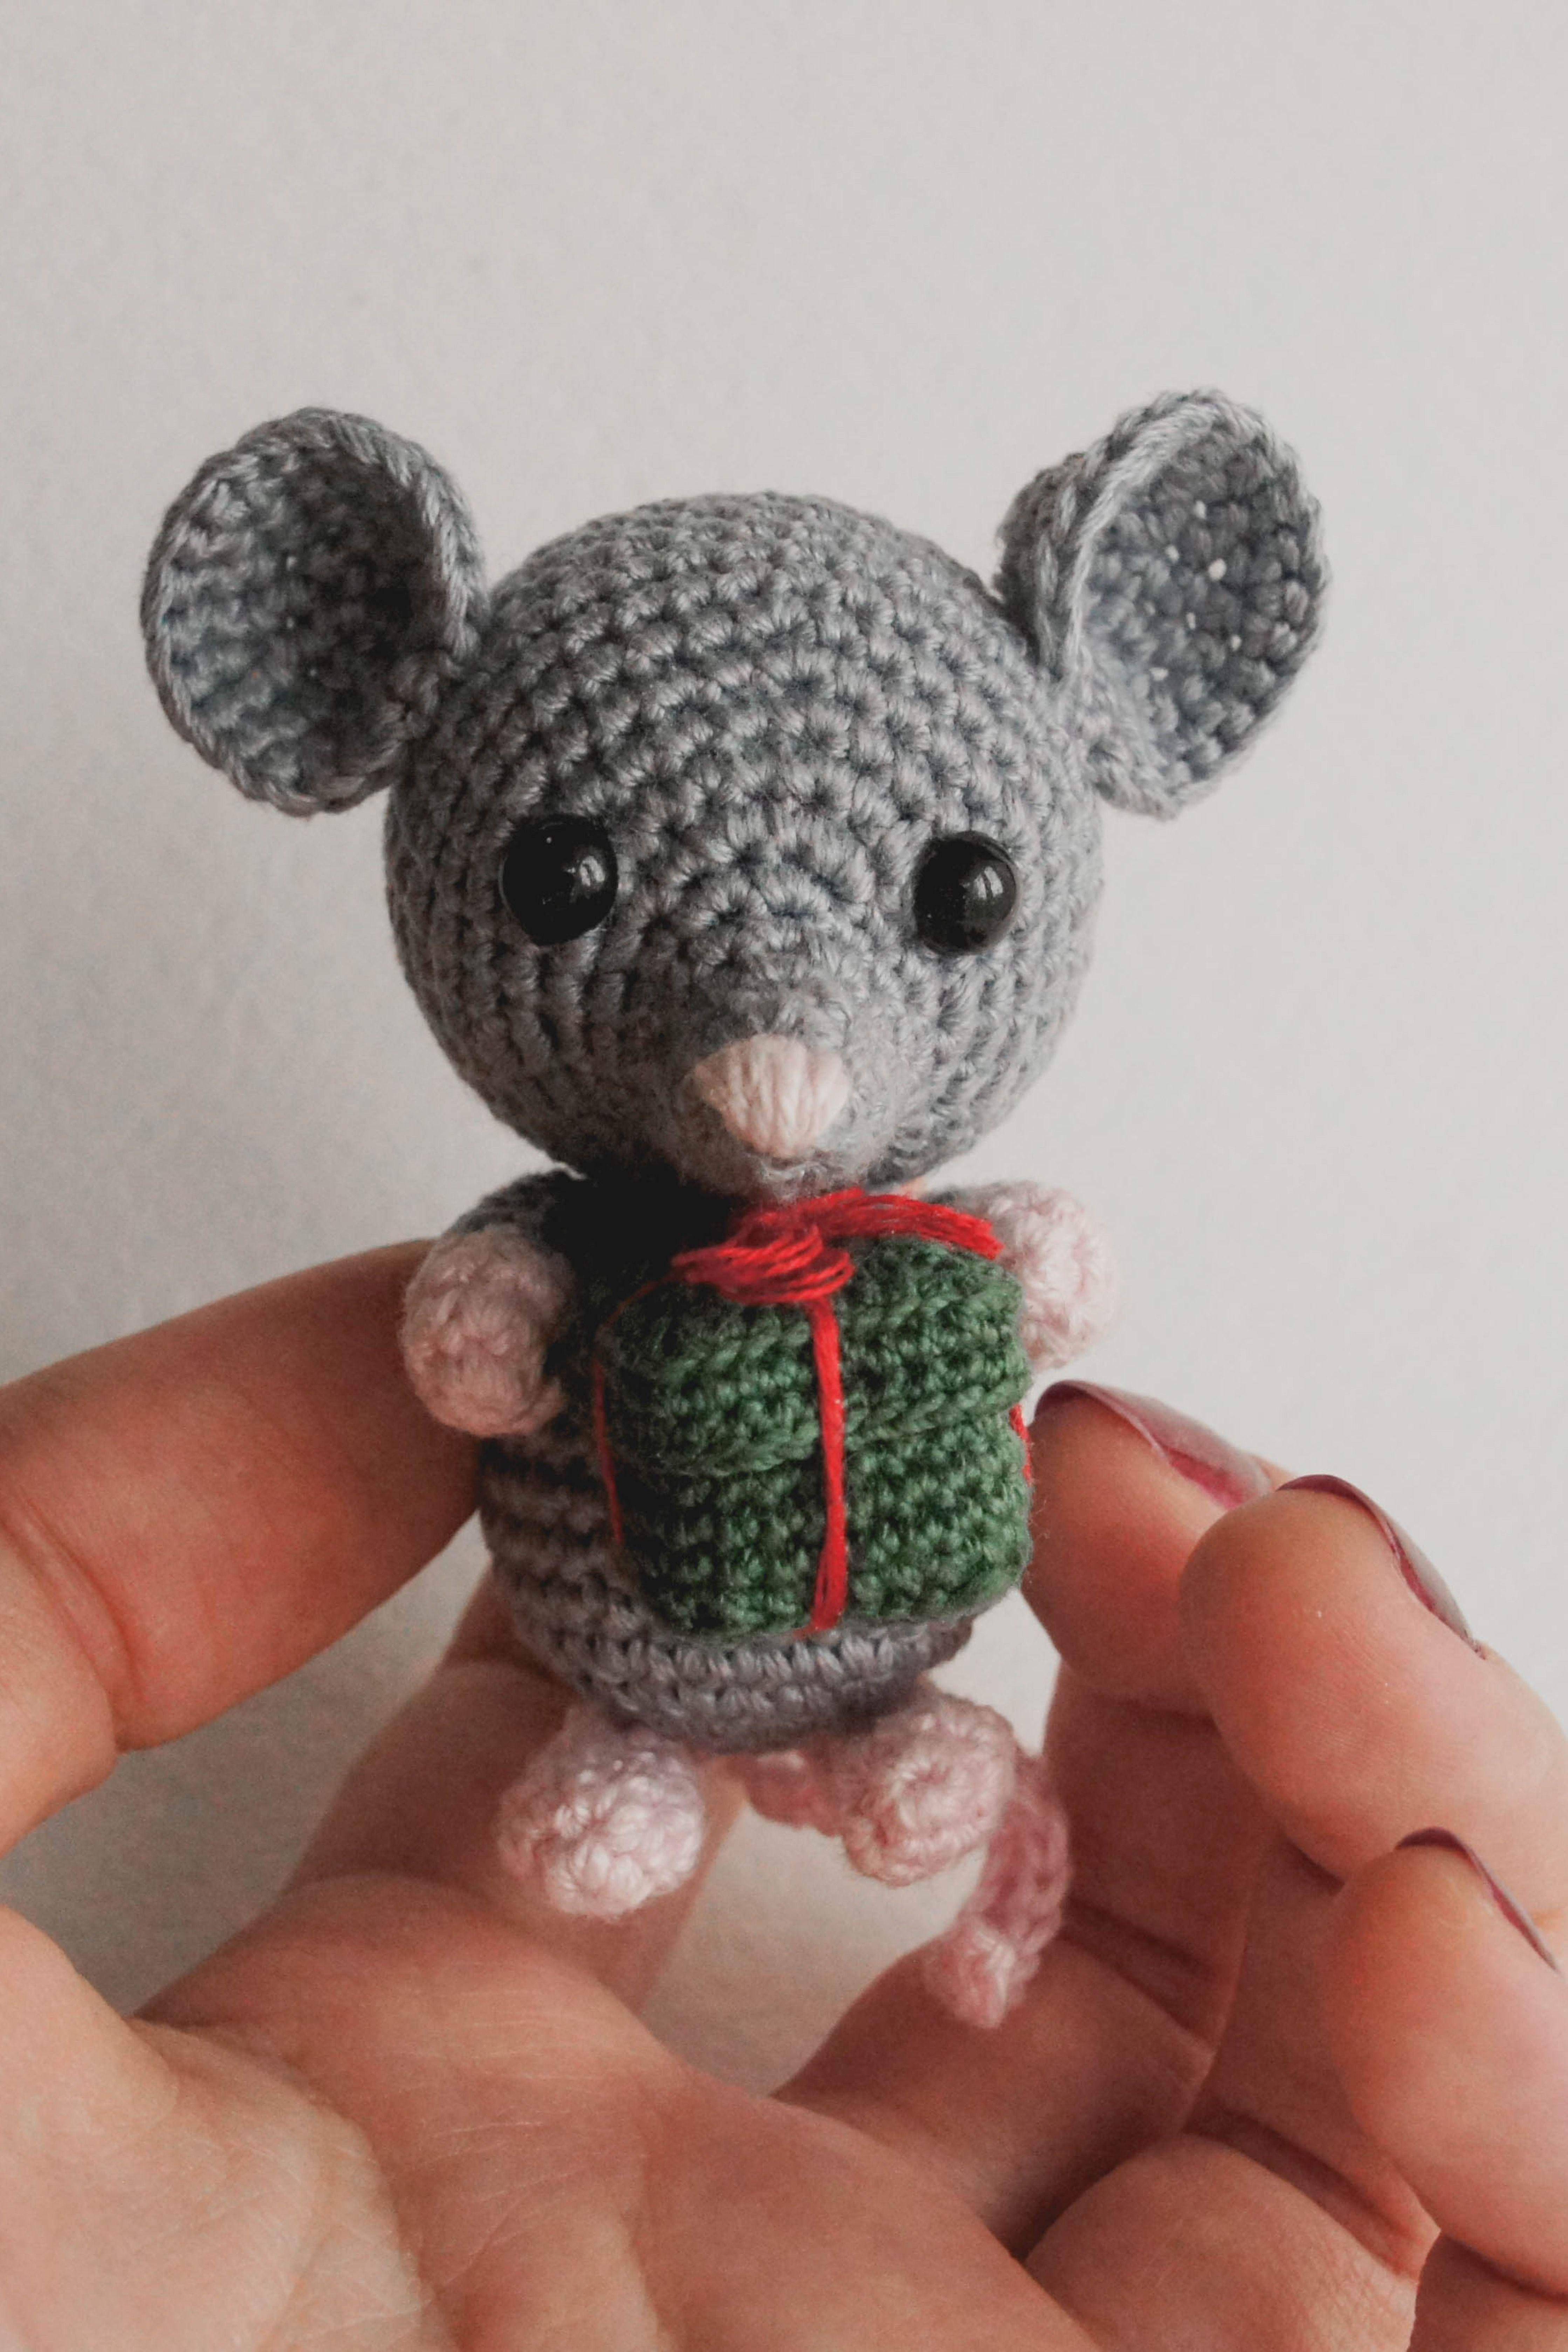 Crochet Tiny Mouse Amigurumi Free Patterns | Kostenlos amigurumi ... | 6714x4476